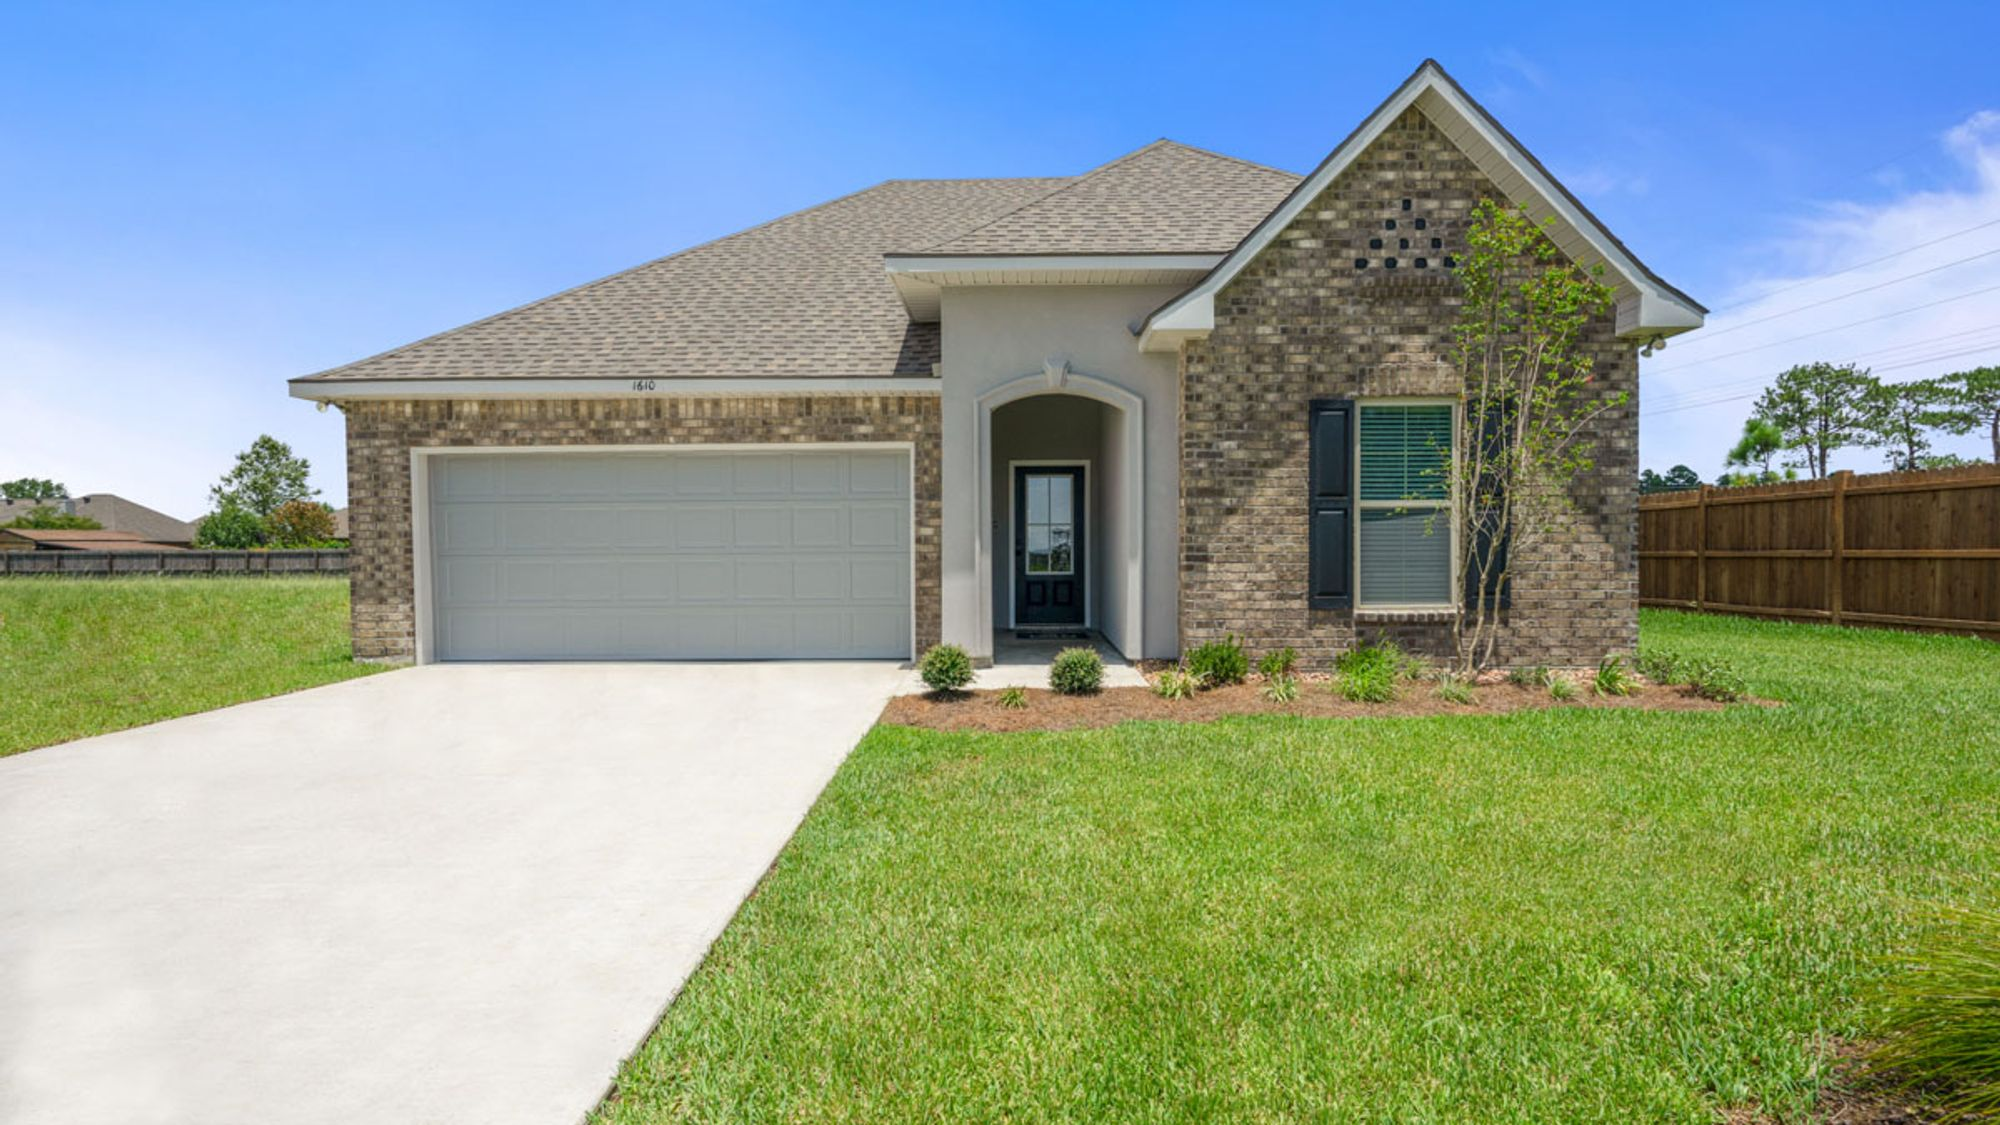 Trillium III A - Orleans Run Model Home - Century Village Community - Monroe, Louisiana - DSLD Homes